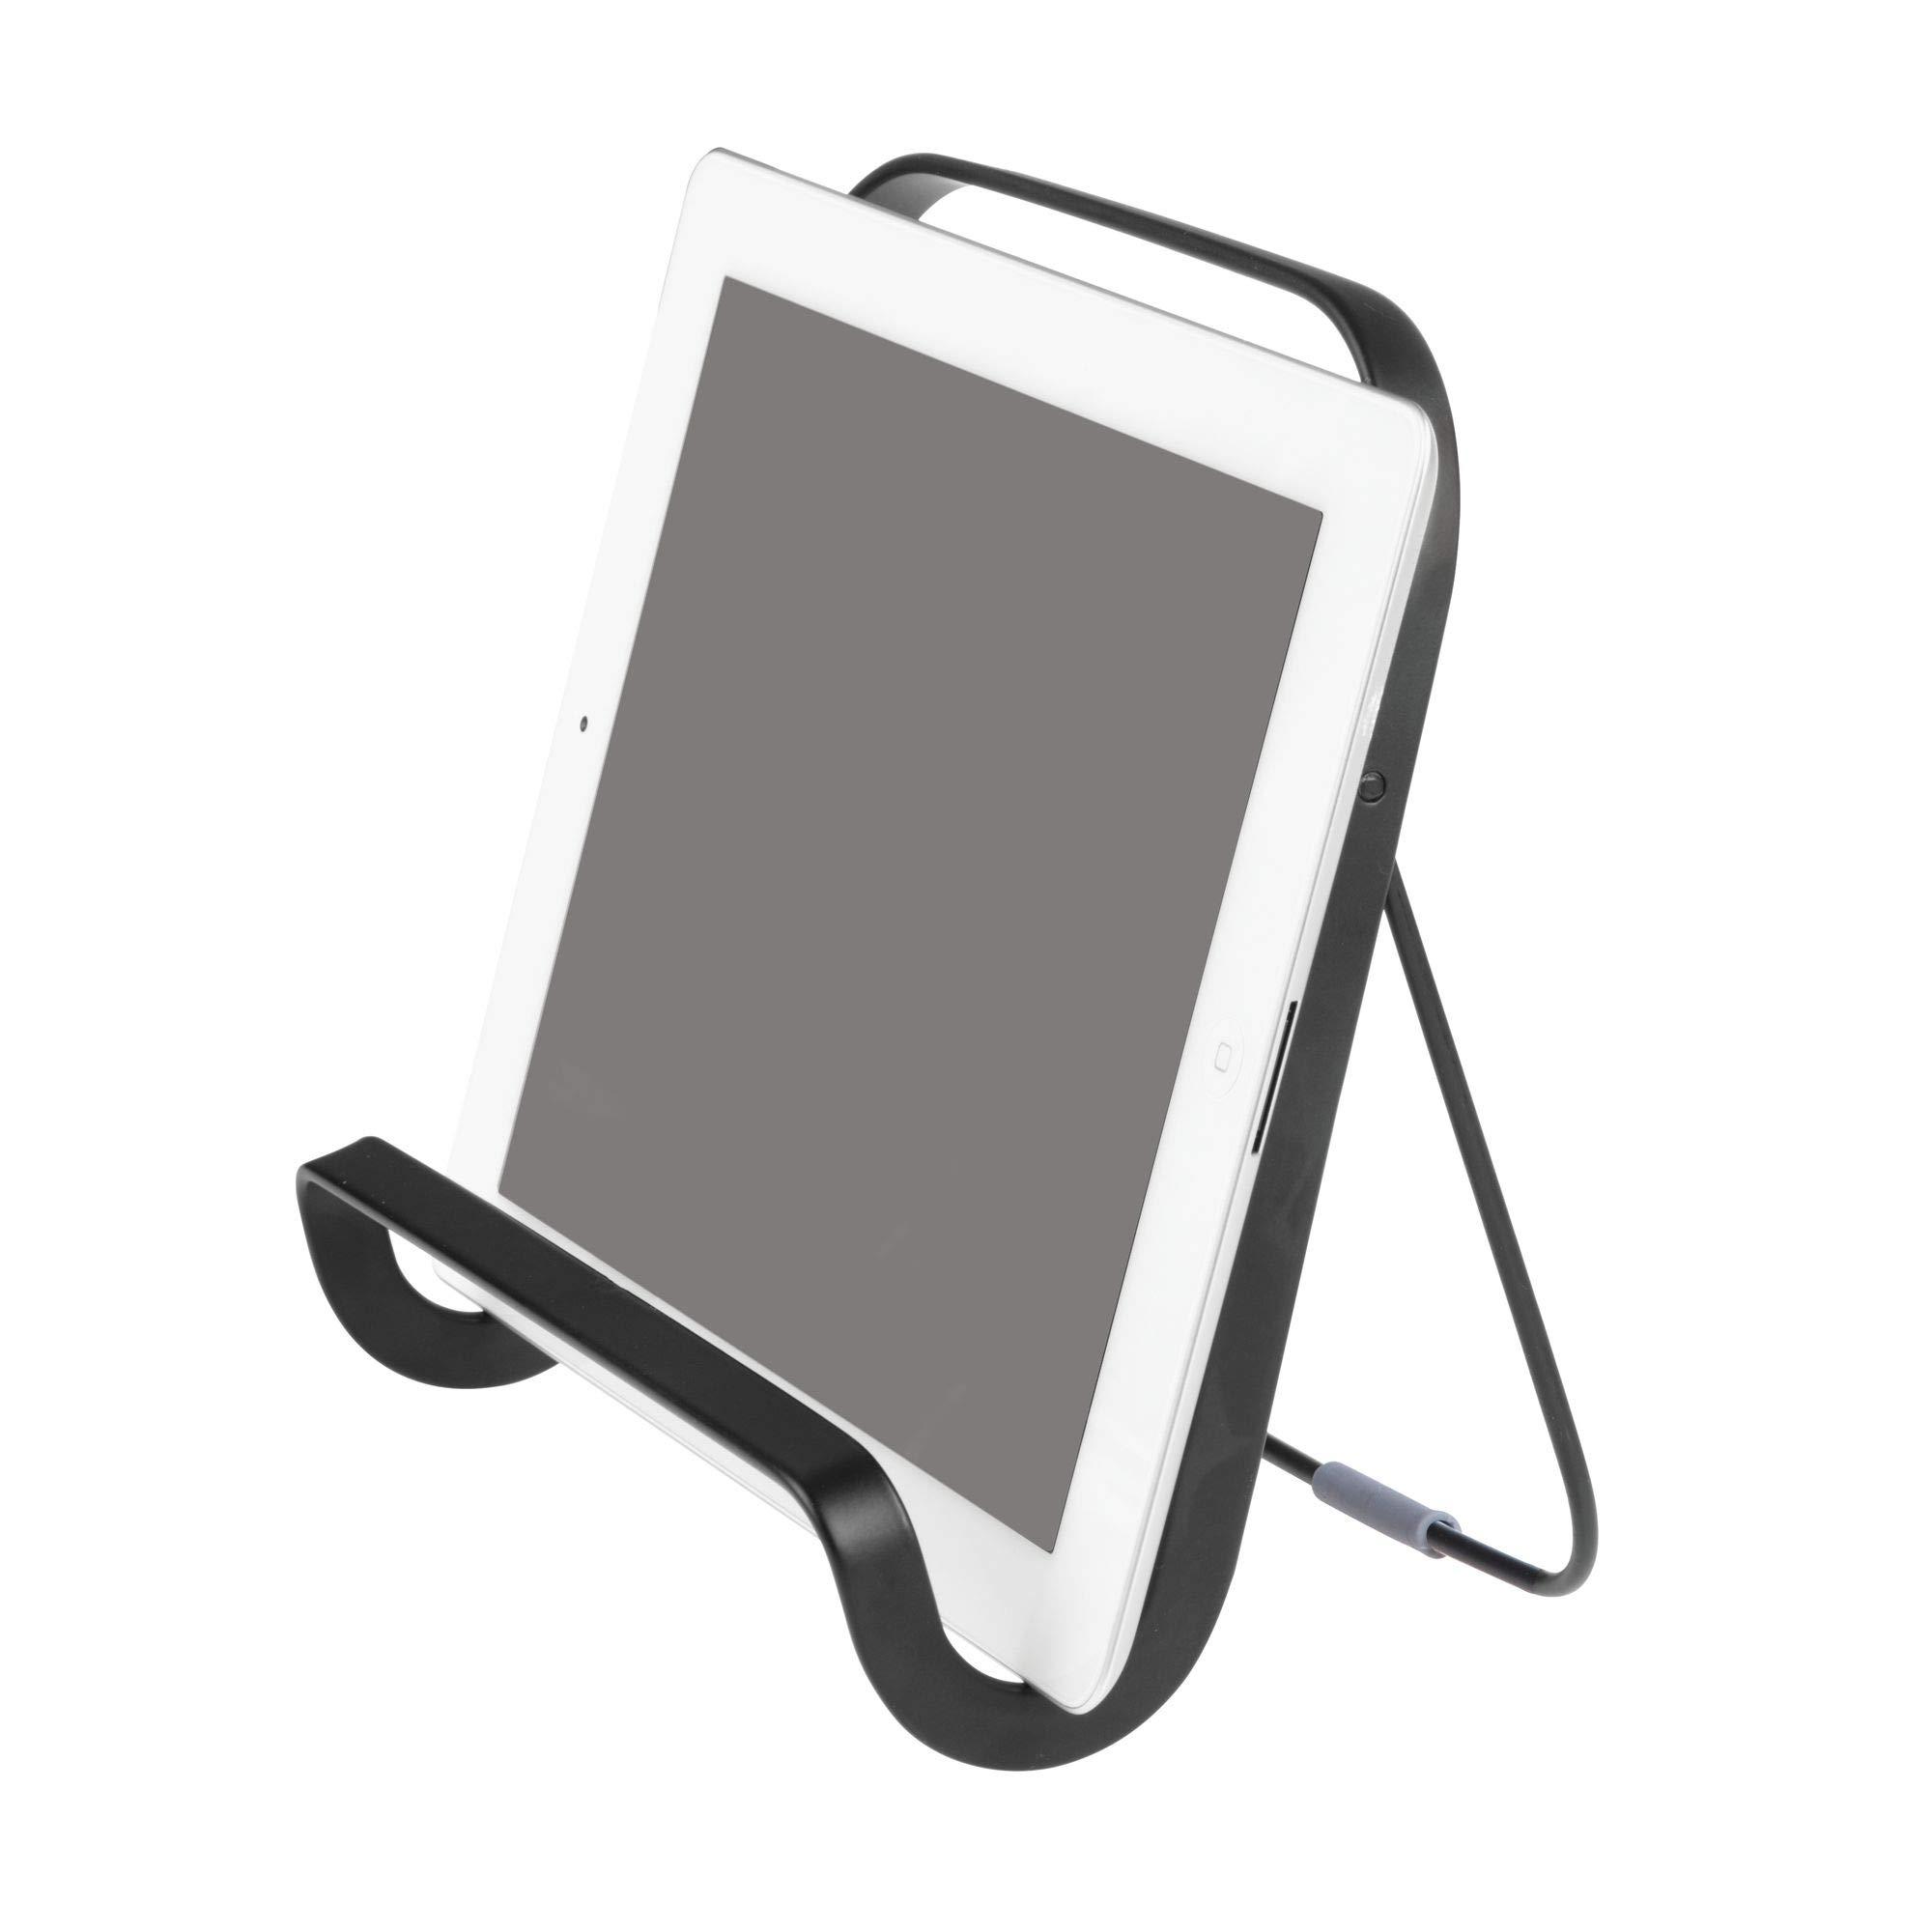 "iDesign Austin Tablet and Cookbook Holder - 7.75"" x 7.87"" x 7.89"", Matte Black/Smoke"